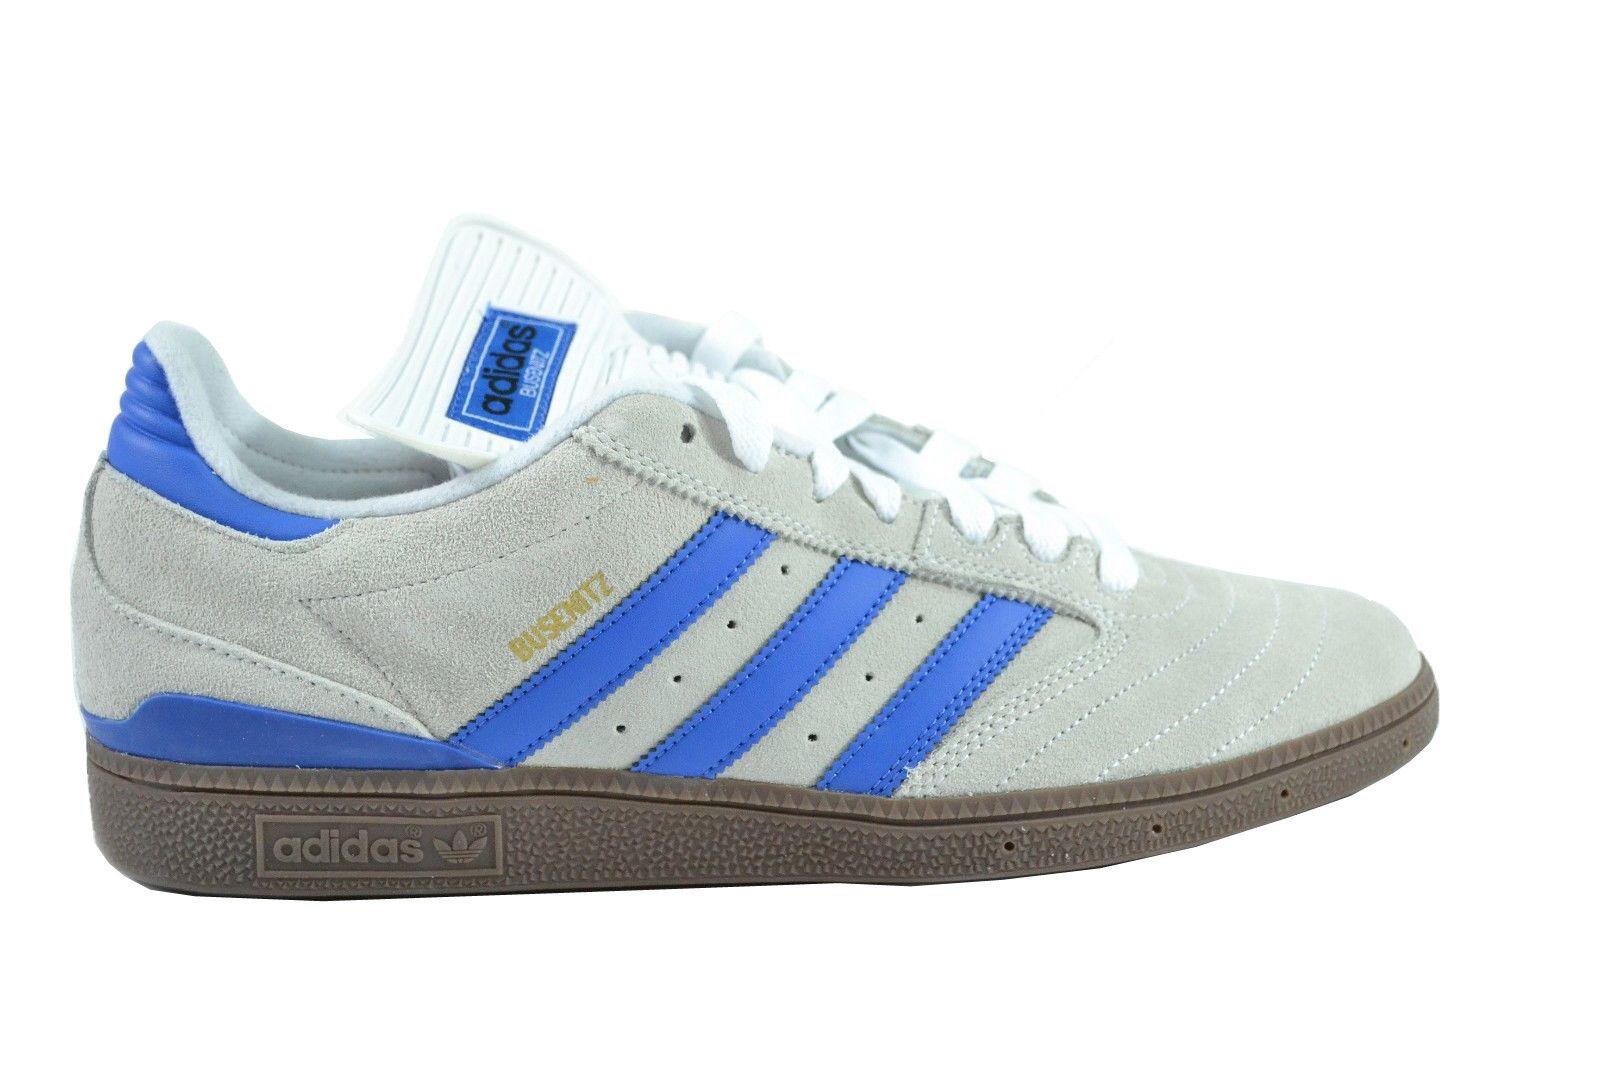 Adidas Gum BUSENITZ Satellite Blue Bone Gum Adidas Skate Sneaker G48056 (183) Men's Shoes 5ed3ee